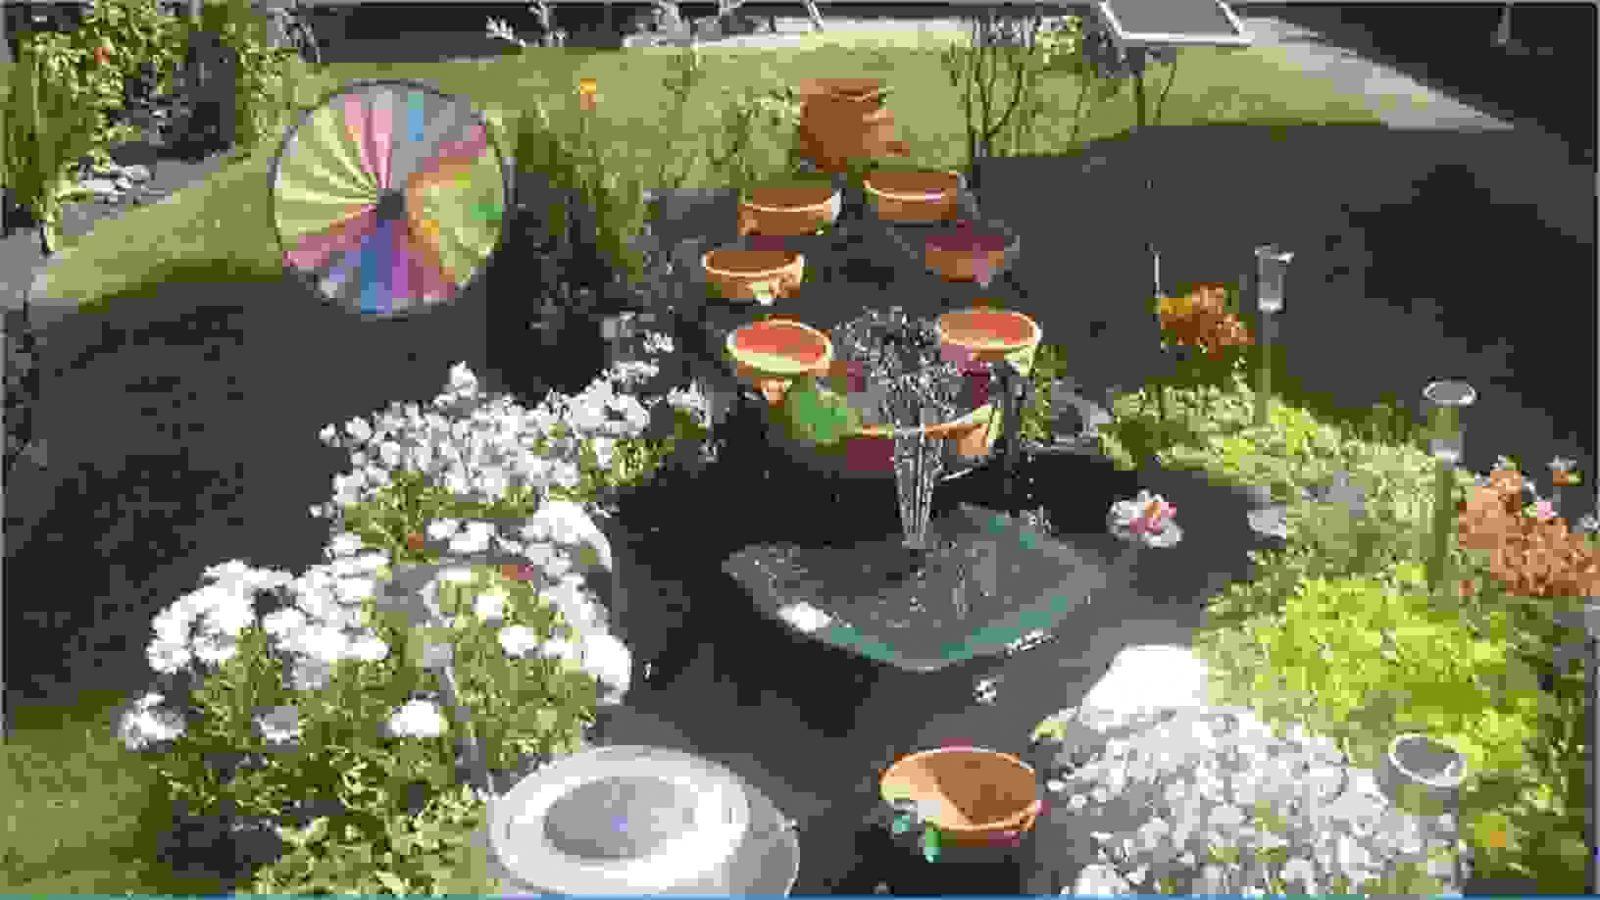 Springbrunnen Garten Selber Bauen – Actoffo Ist Frisch Ideen Von von Brunnen Garten Selber Bauen Photo